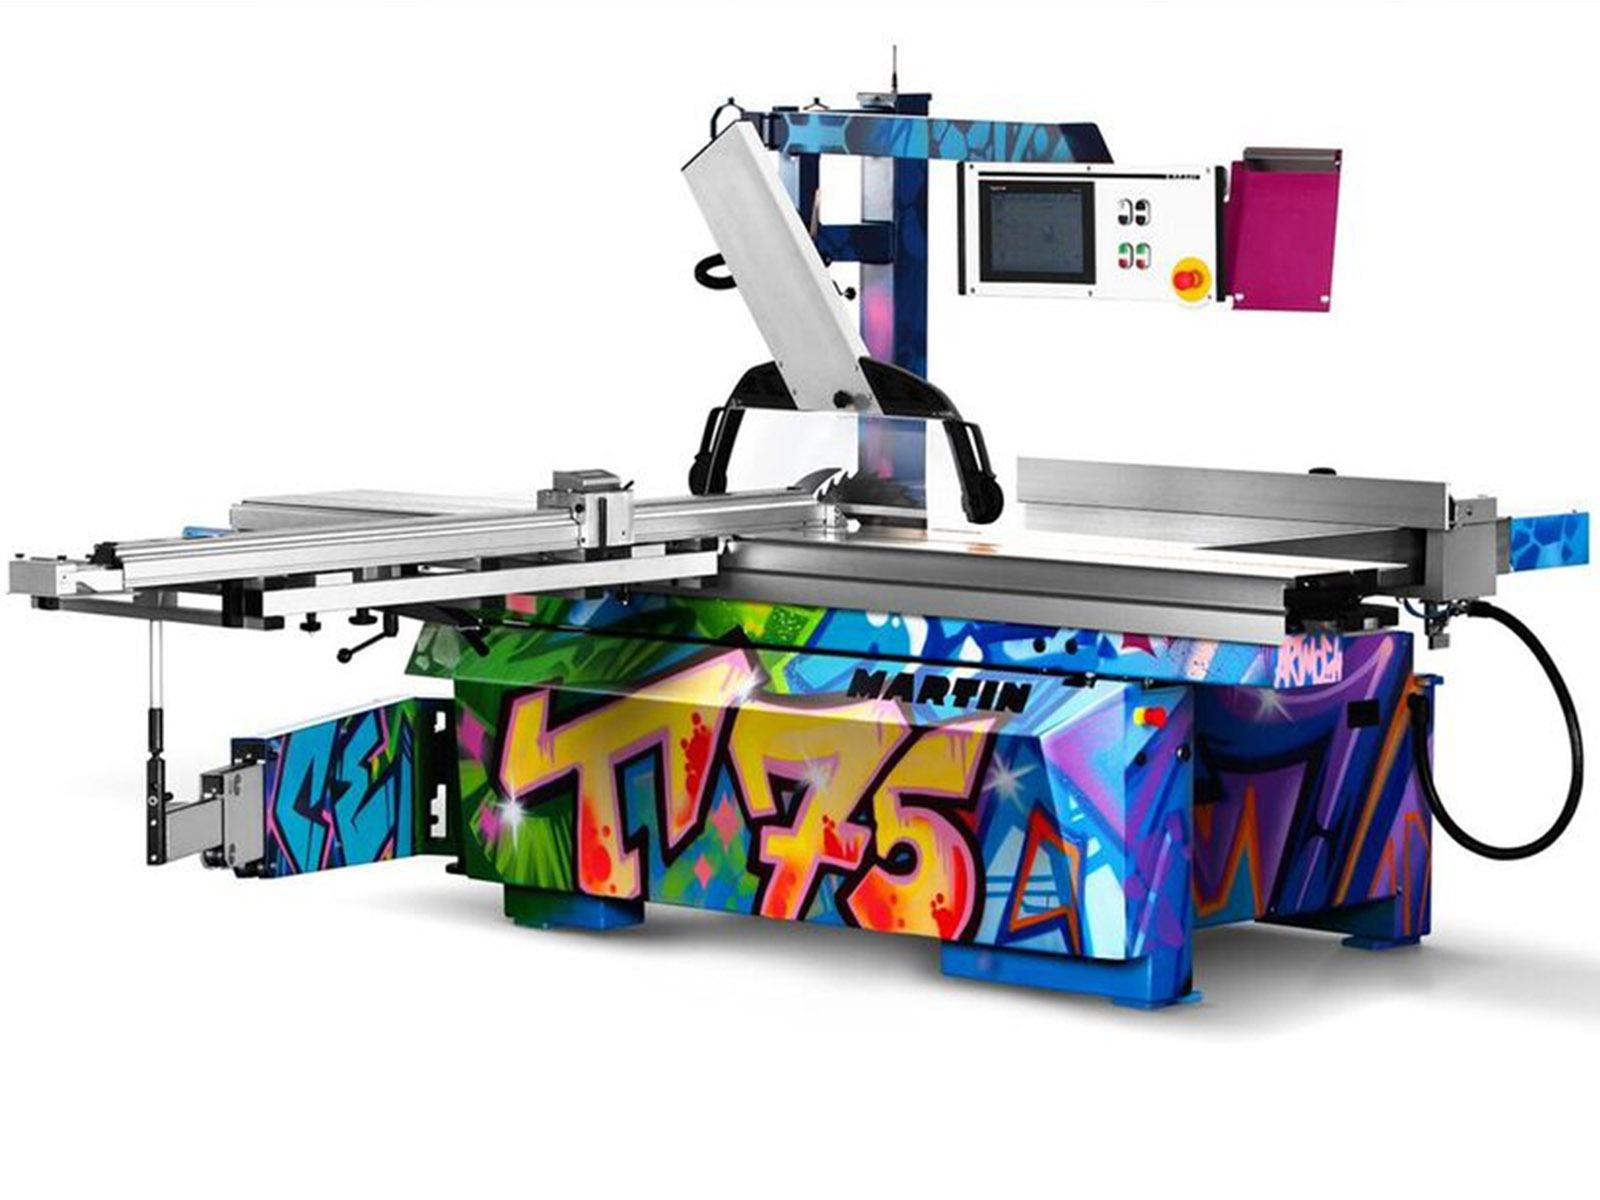 graffitiauftrag-graffitikuenstler-artmos4-otto-martin-gmbh-formatkreissaege2-artmos4-graffitiauftrag-graffiti-syle-tag-streetart-maschine